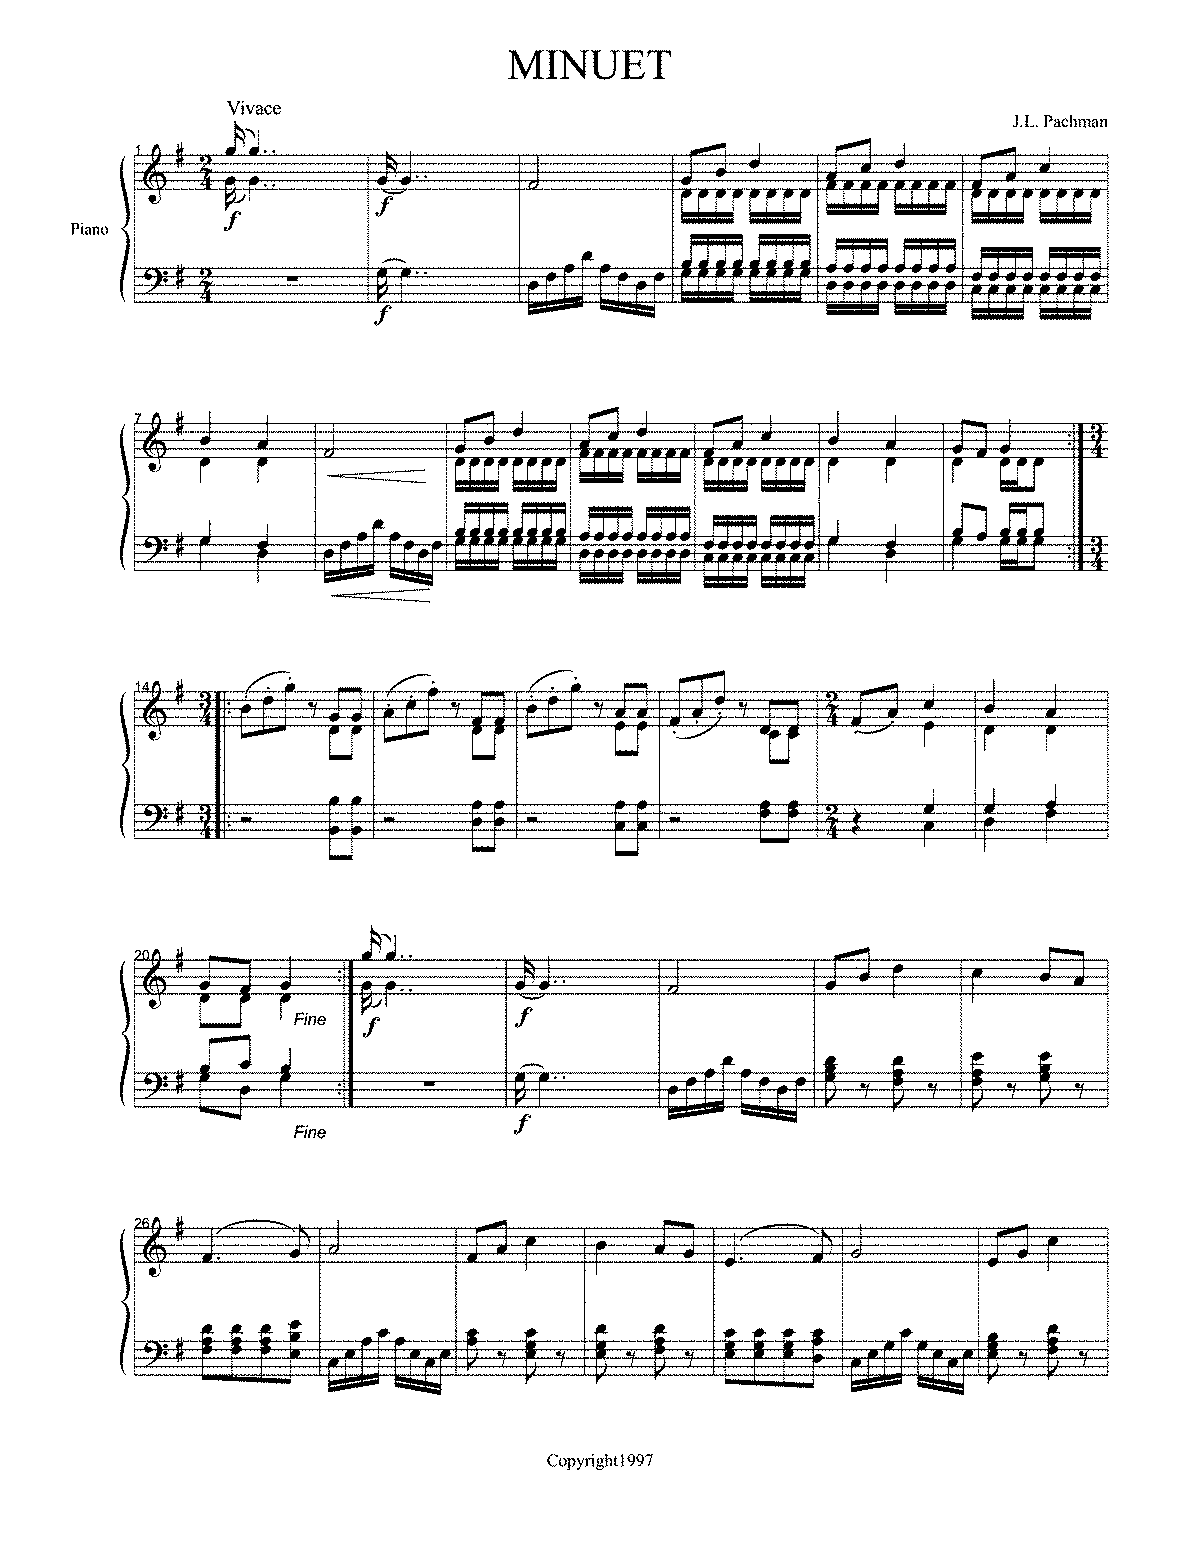 Minuet (Pachman, Jason L ) - IMSLP/Petrucci Music Library: Free